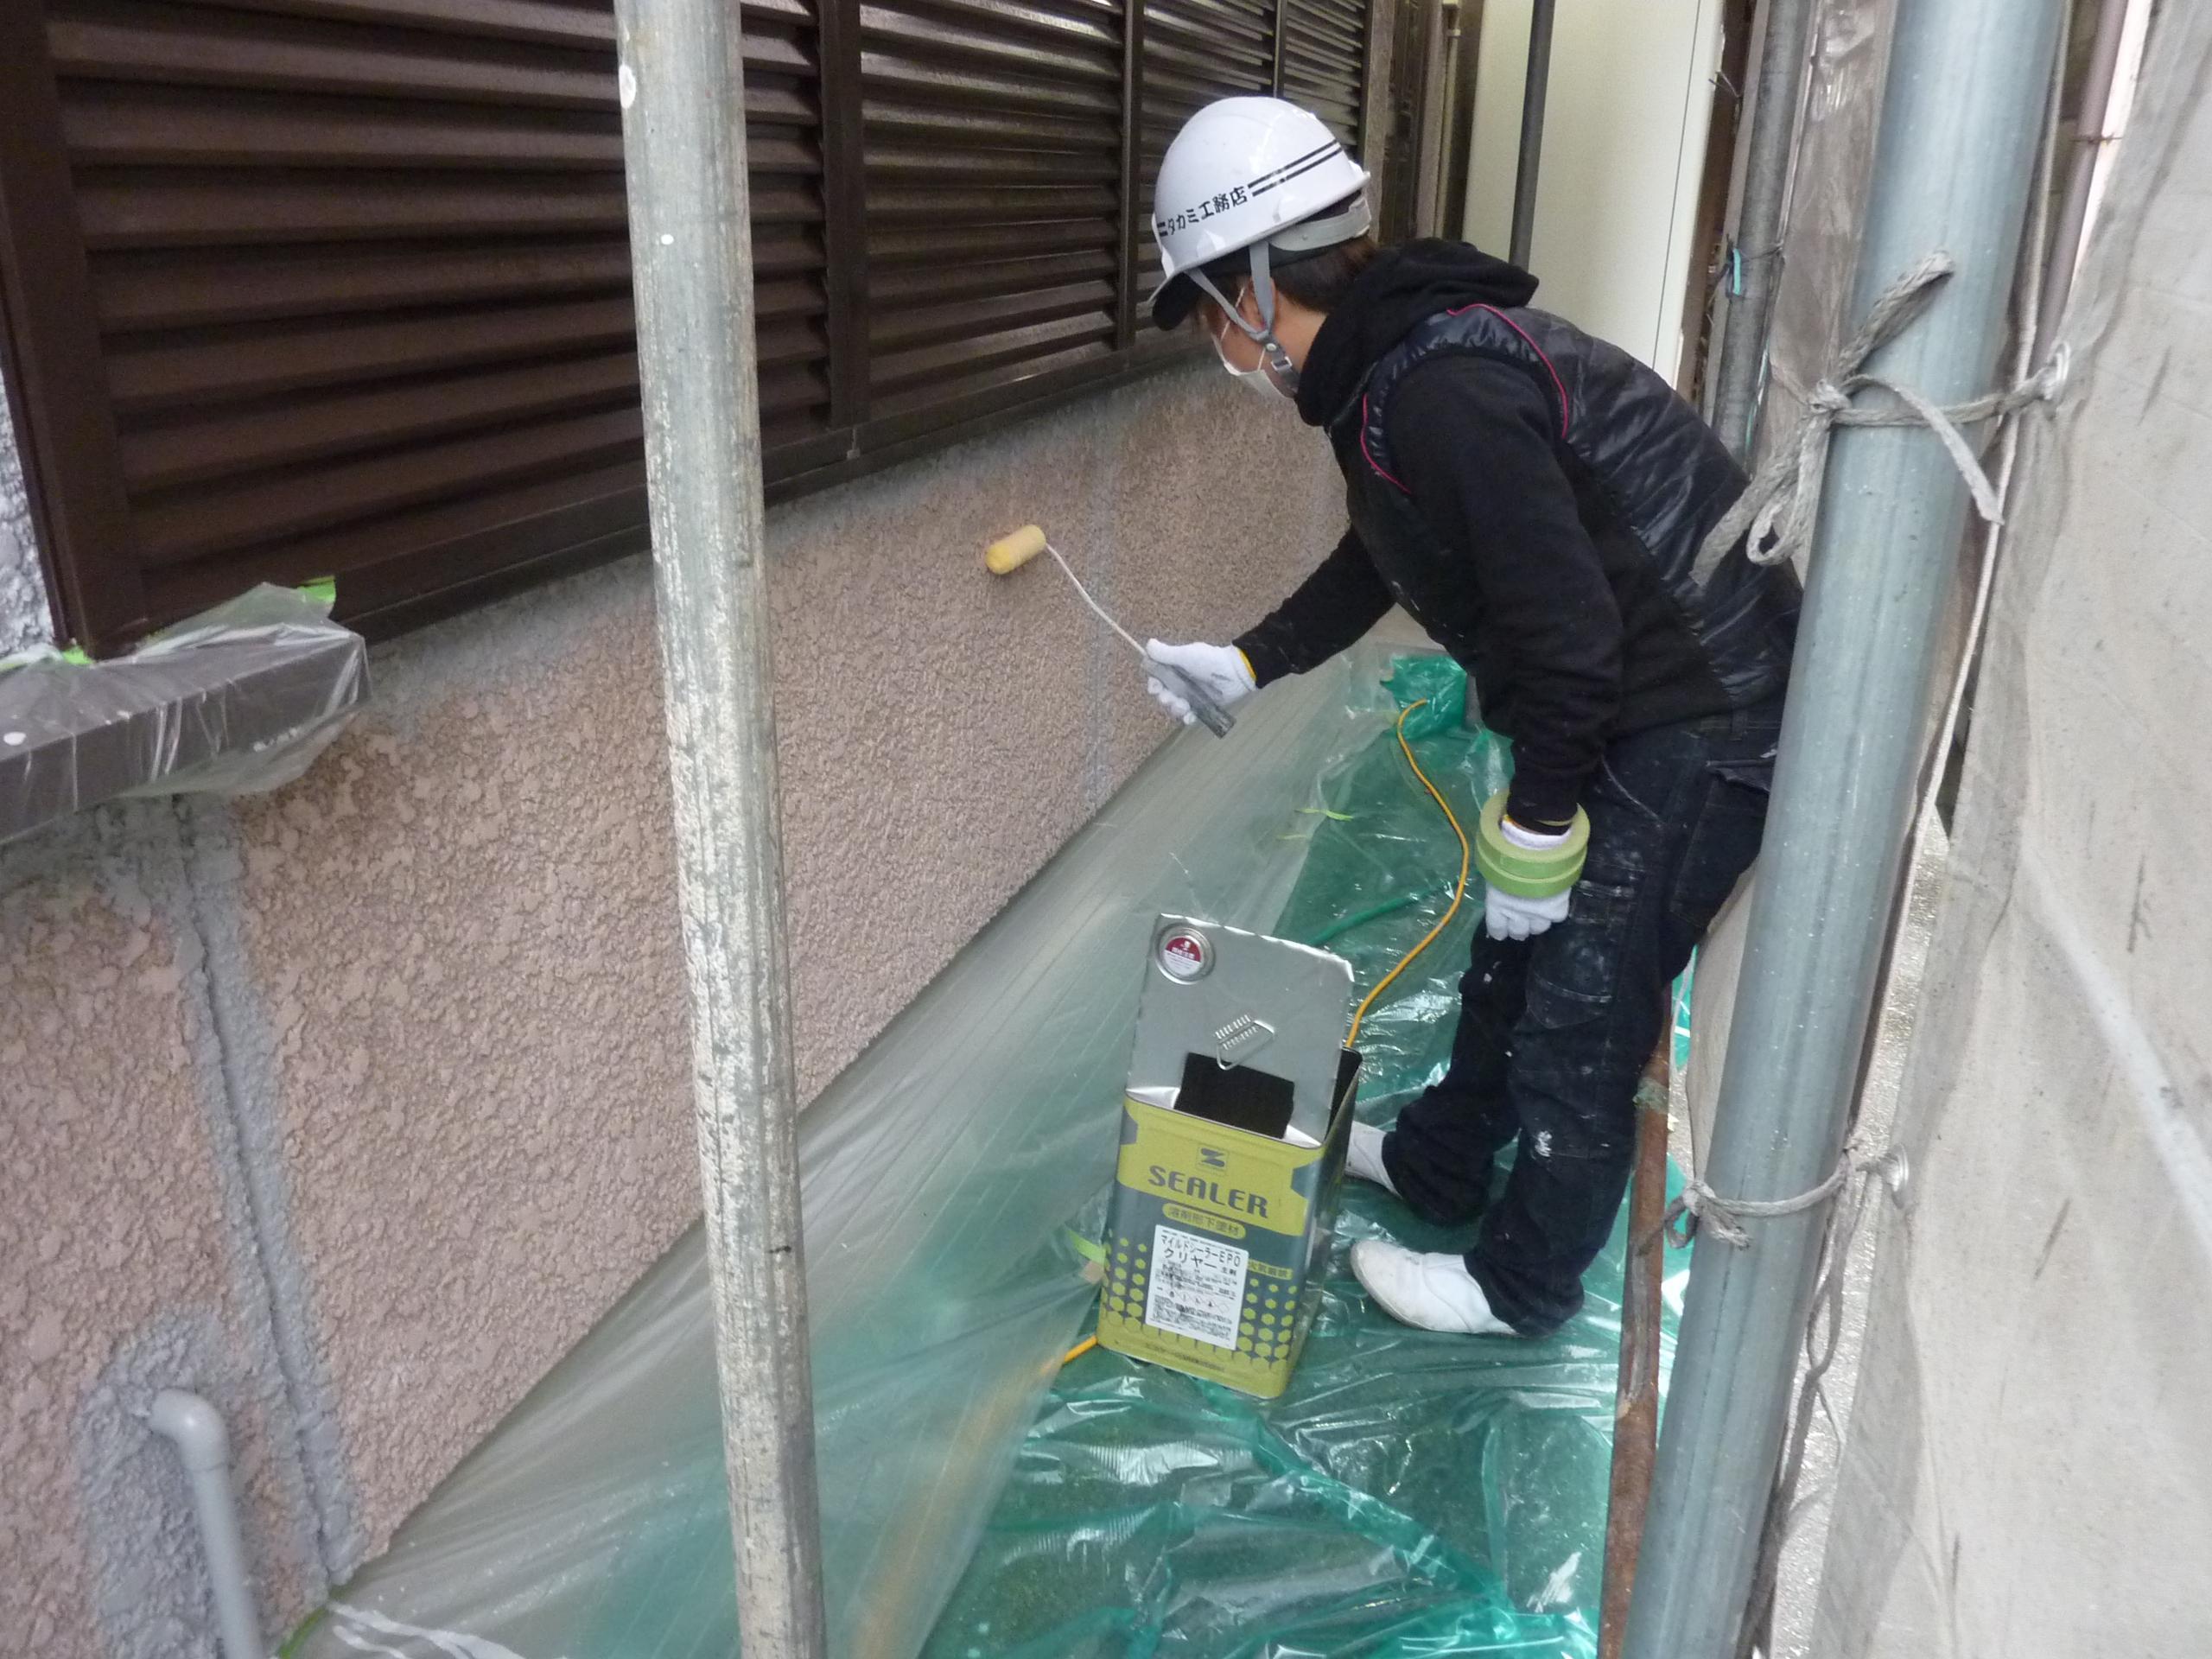 京都 城陽 宇治-タカミ工務店 外壁塗装